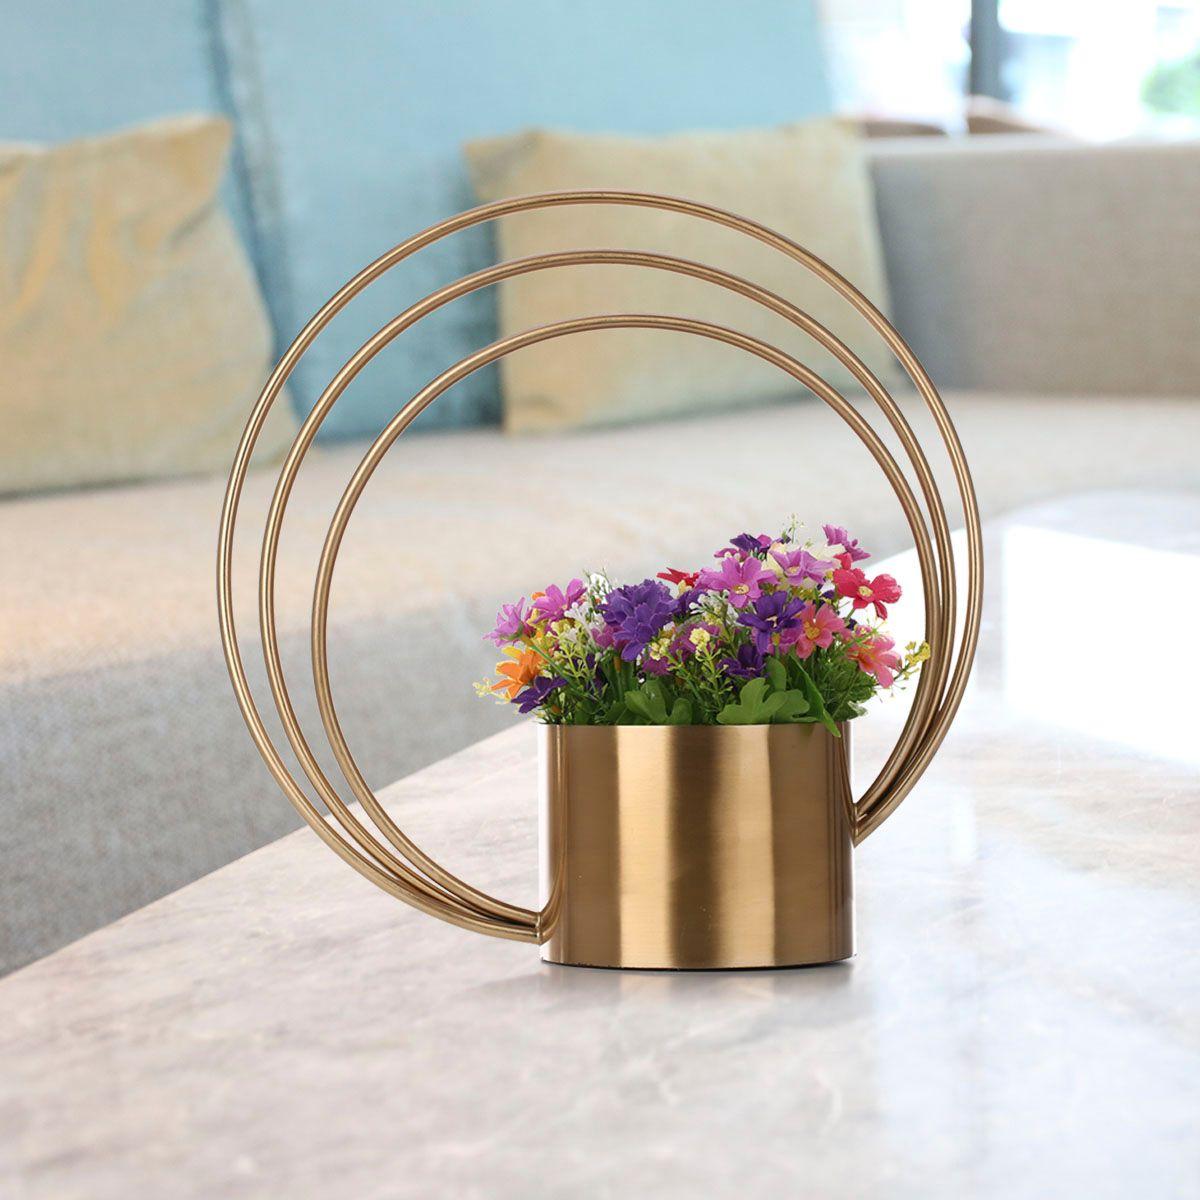 DHgate.com & Tooast Flower Pot Metal Ornament Cylinder Shape Handle Vase Fashionable Ornament Centerpiece for Home Wedding Table Decorative